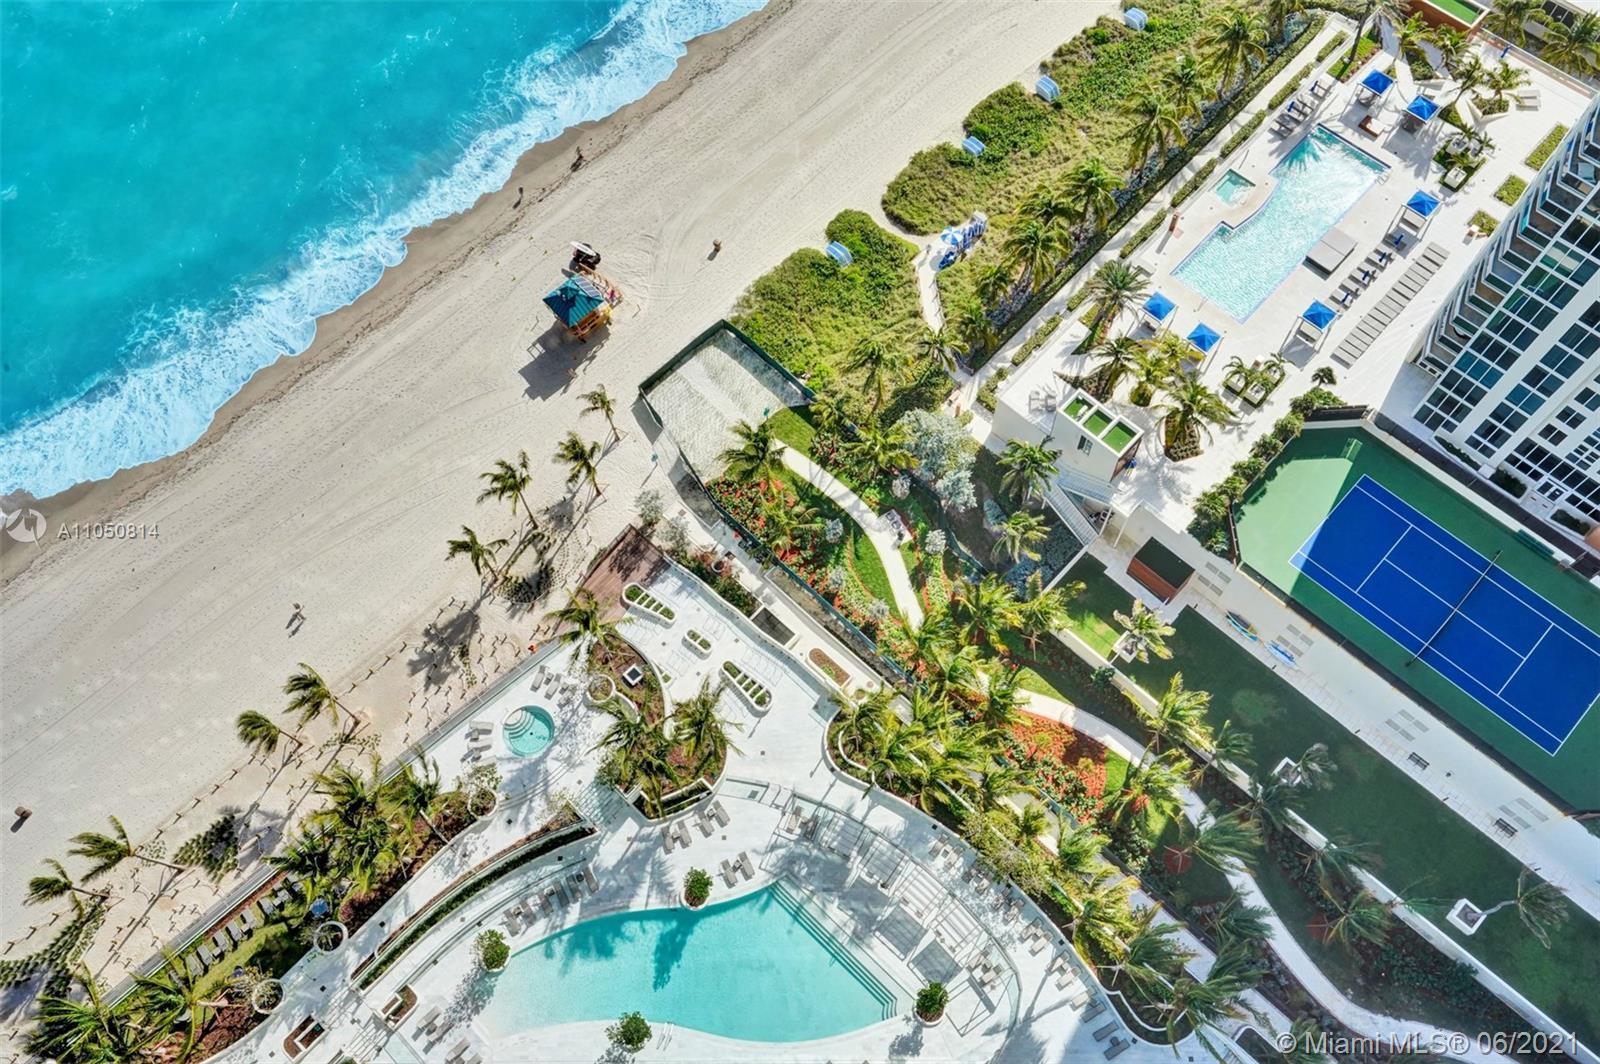 Unbelievable Penthouse Views from this ultra-luxury 2 bedroom residence. Breathtaking Atlantic Ocean